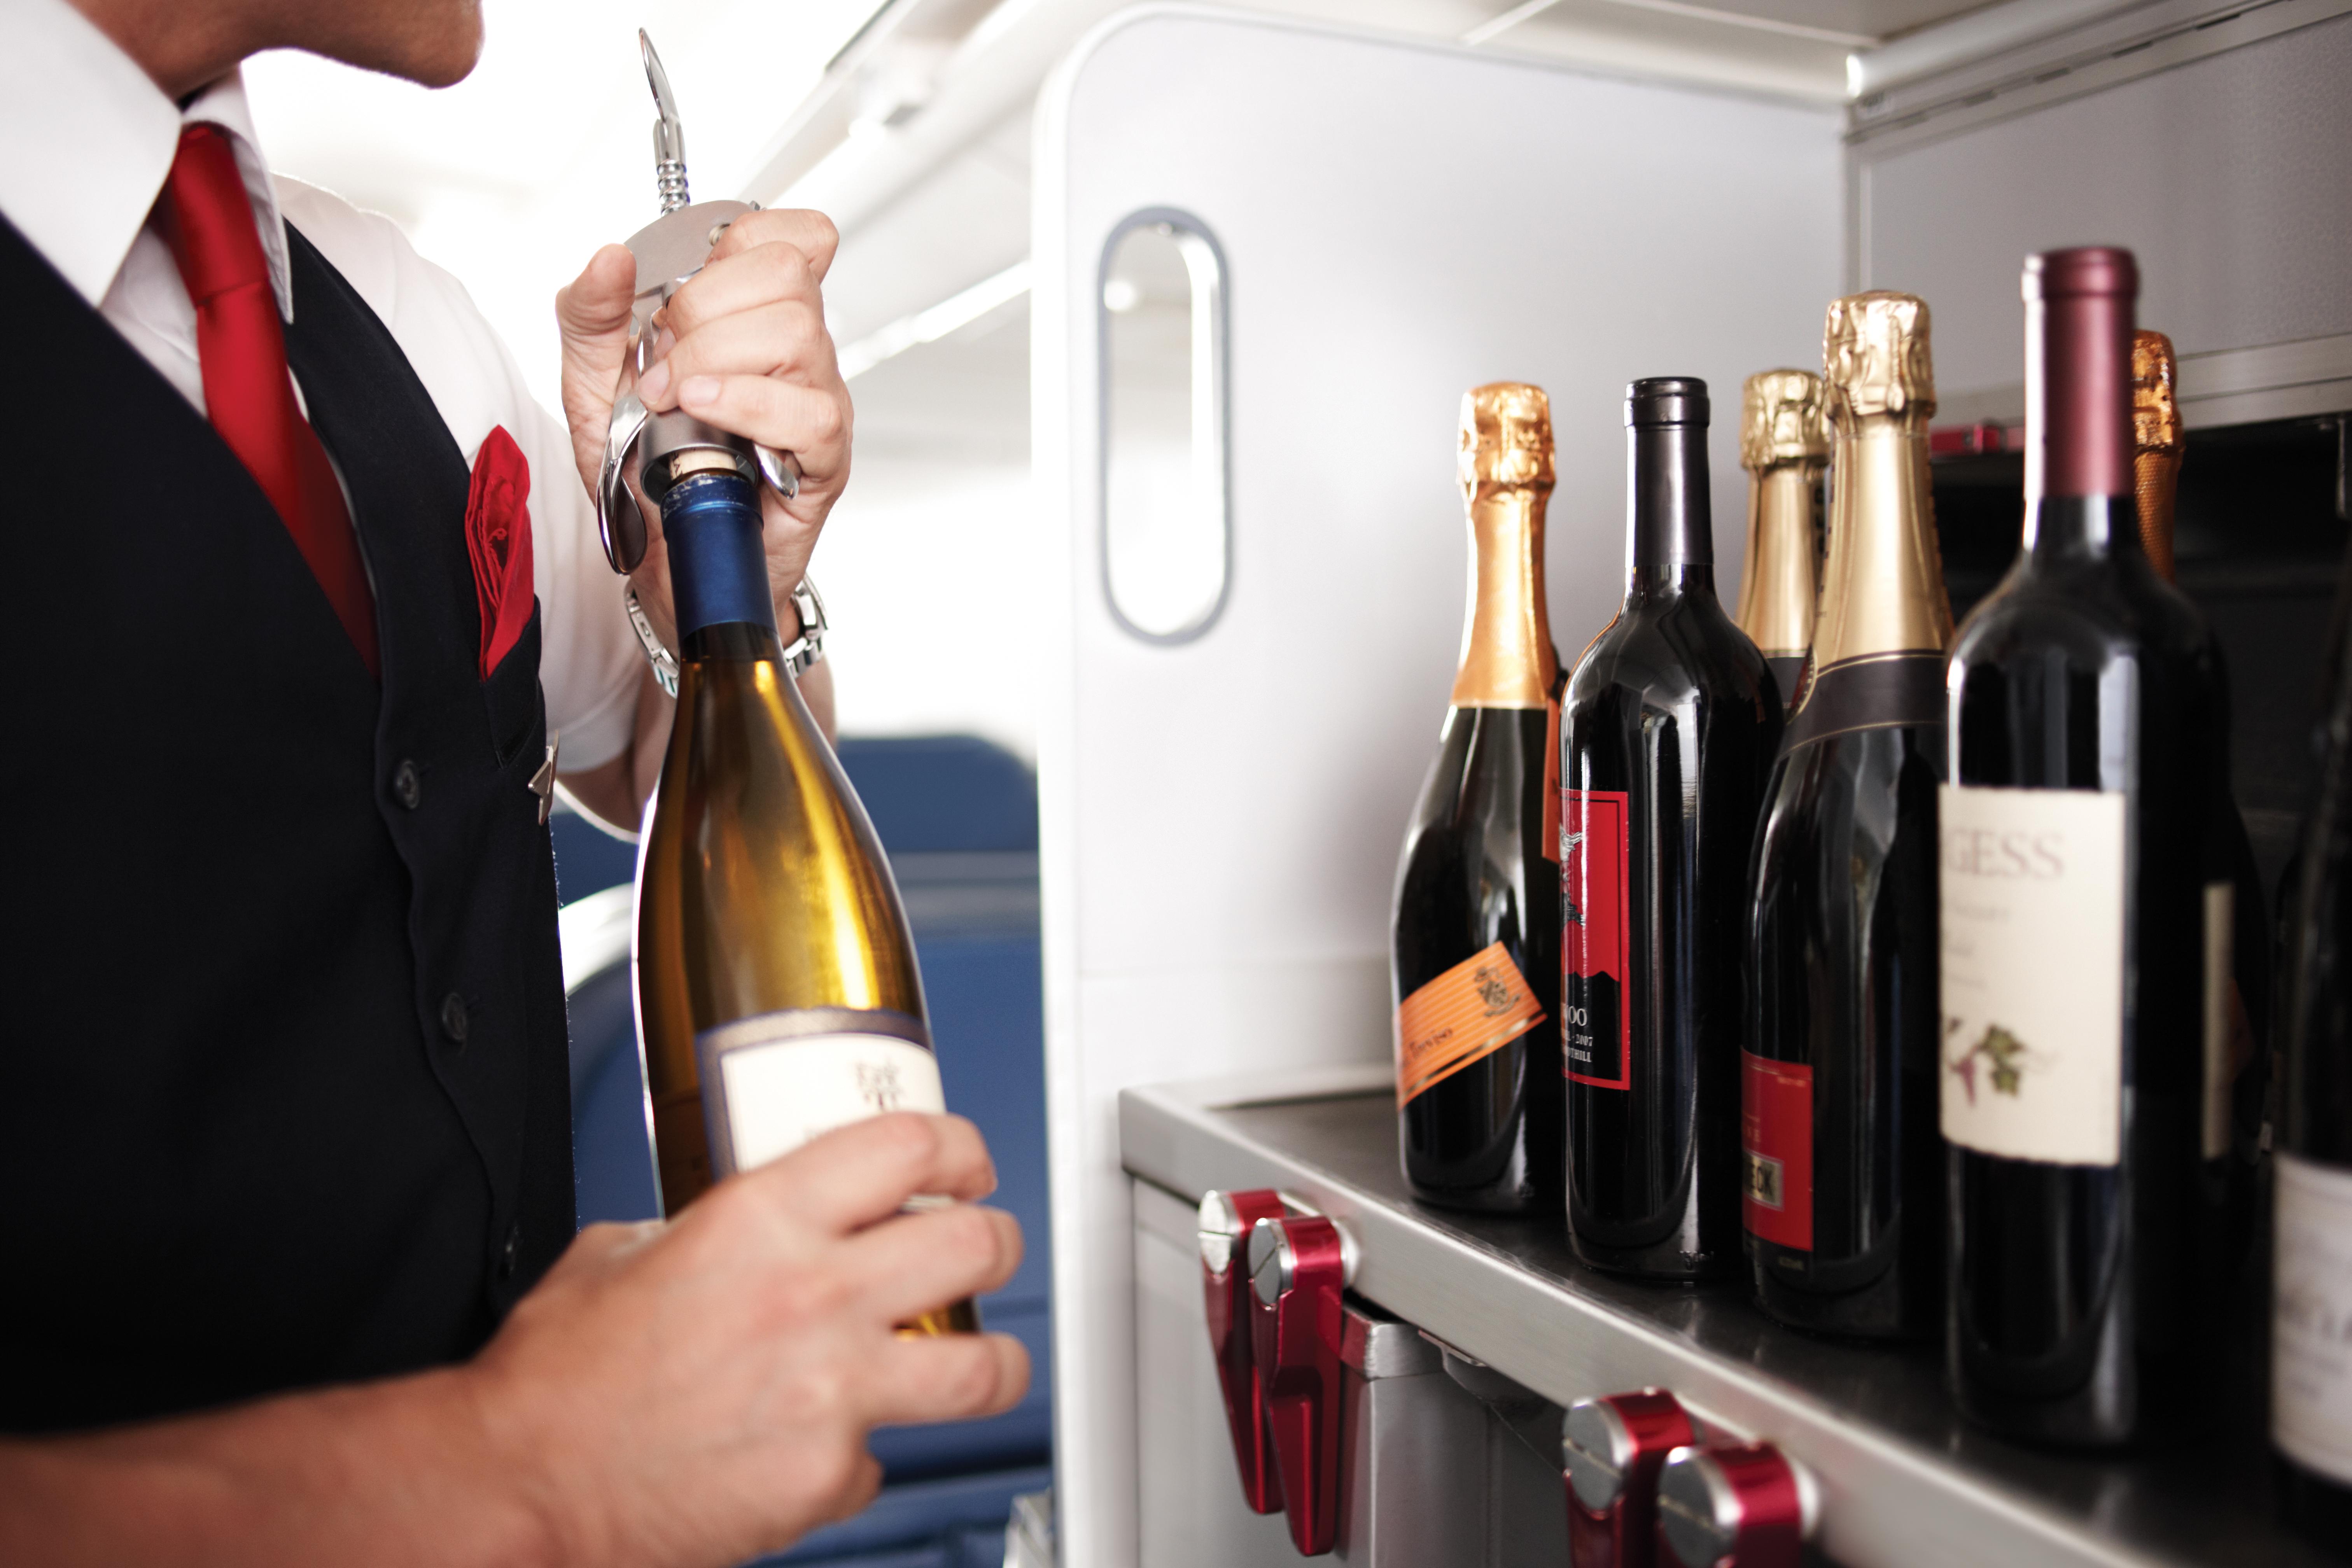 wine selection process